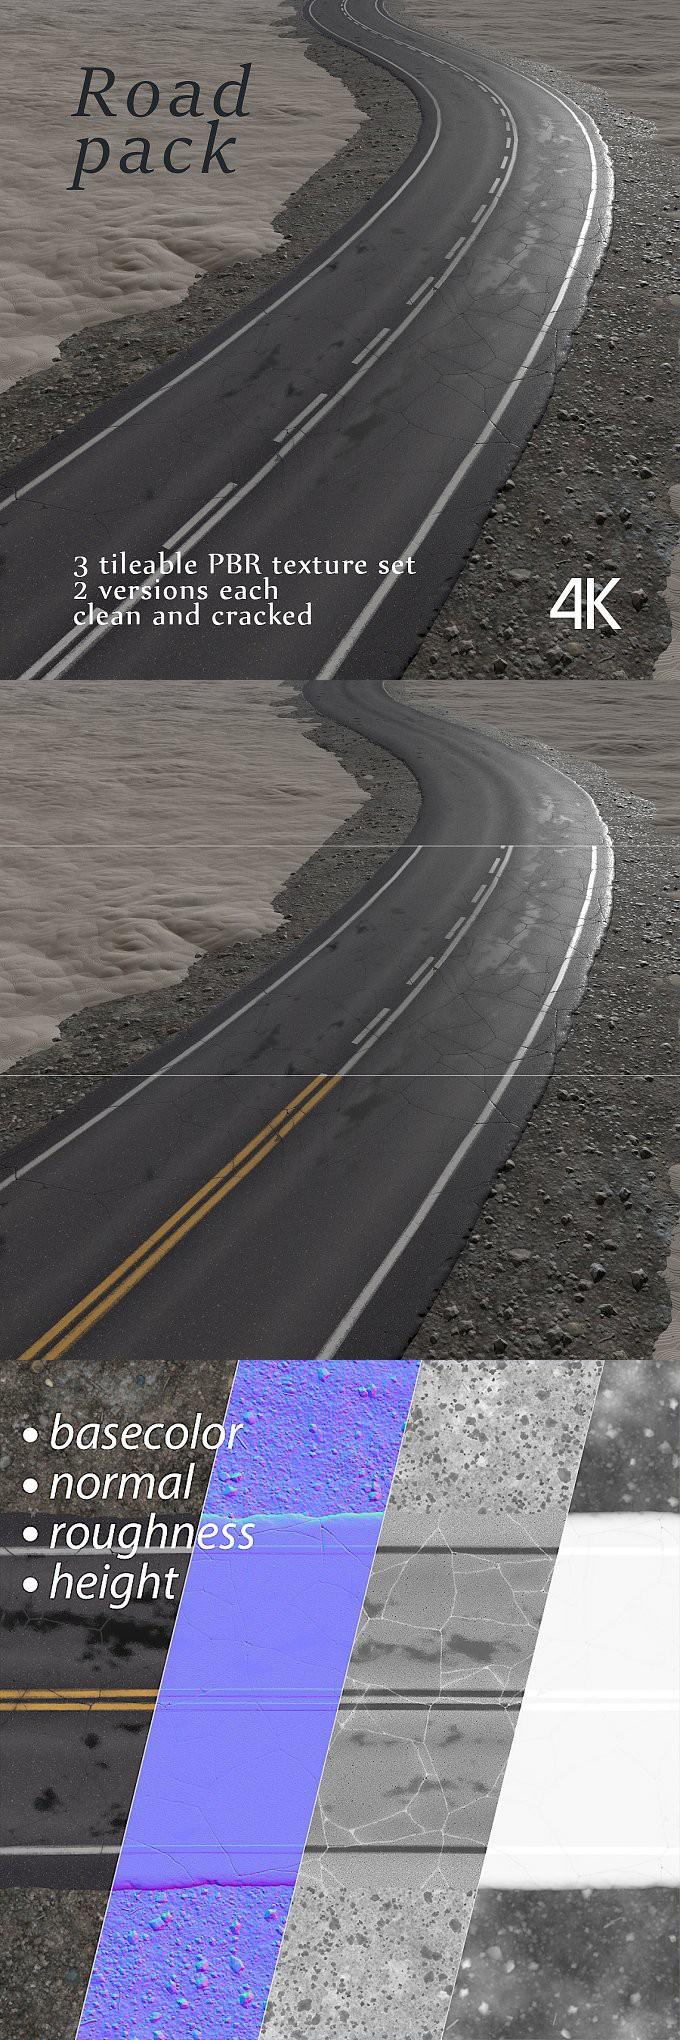 Textures architecture roads roads dirt road texture seamless - Road Texture Pack Pbr Roadstexture